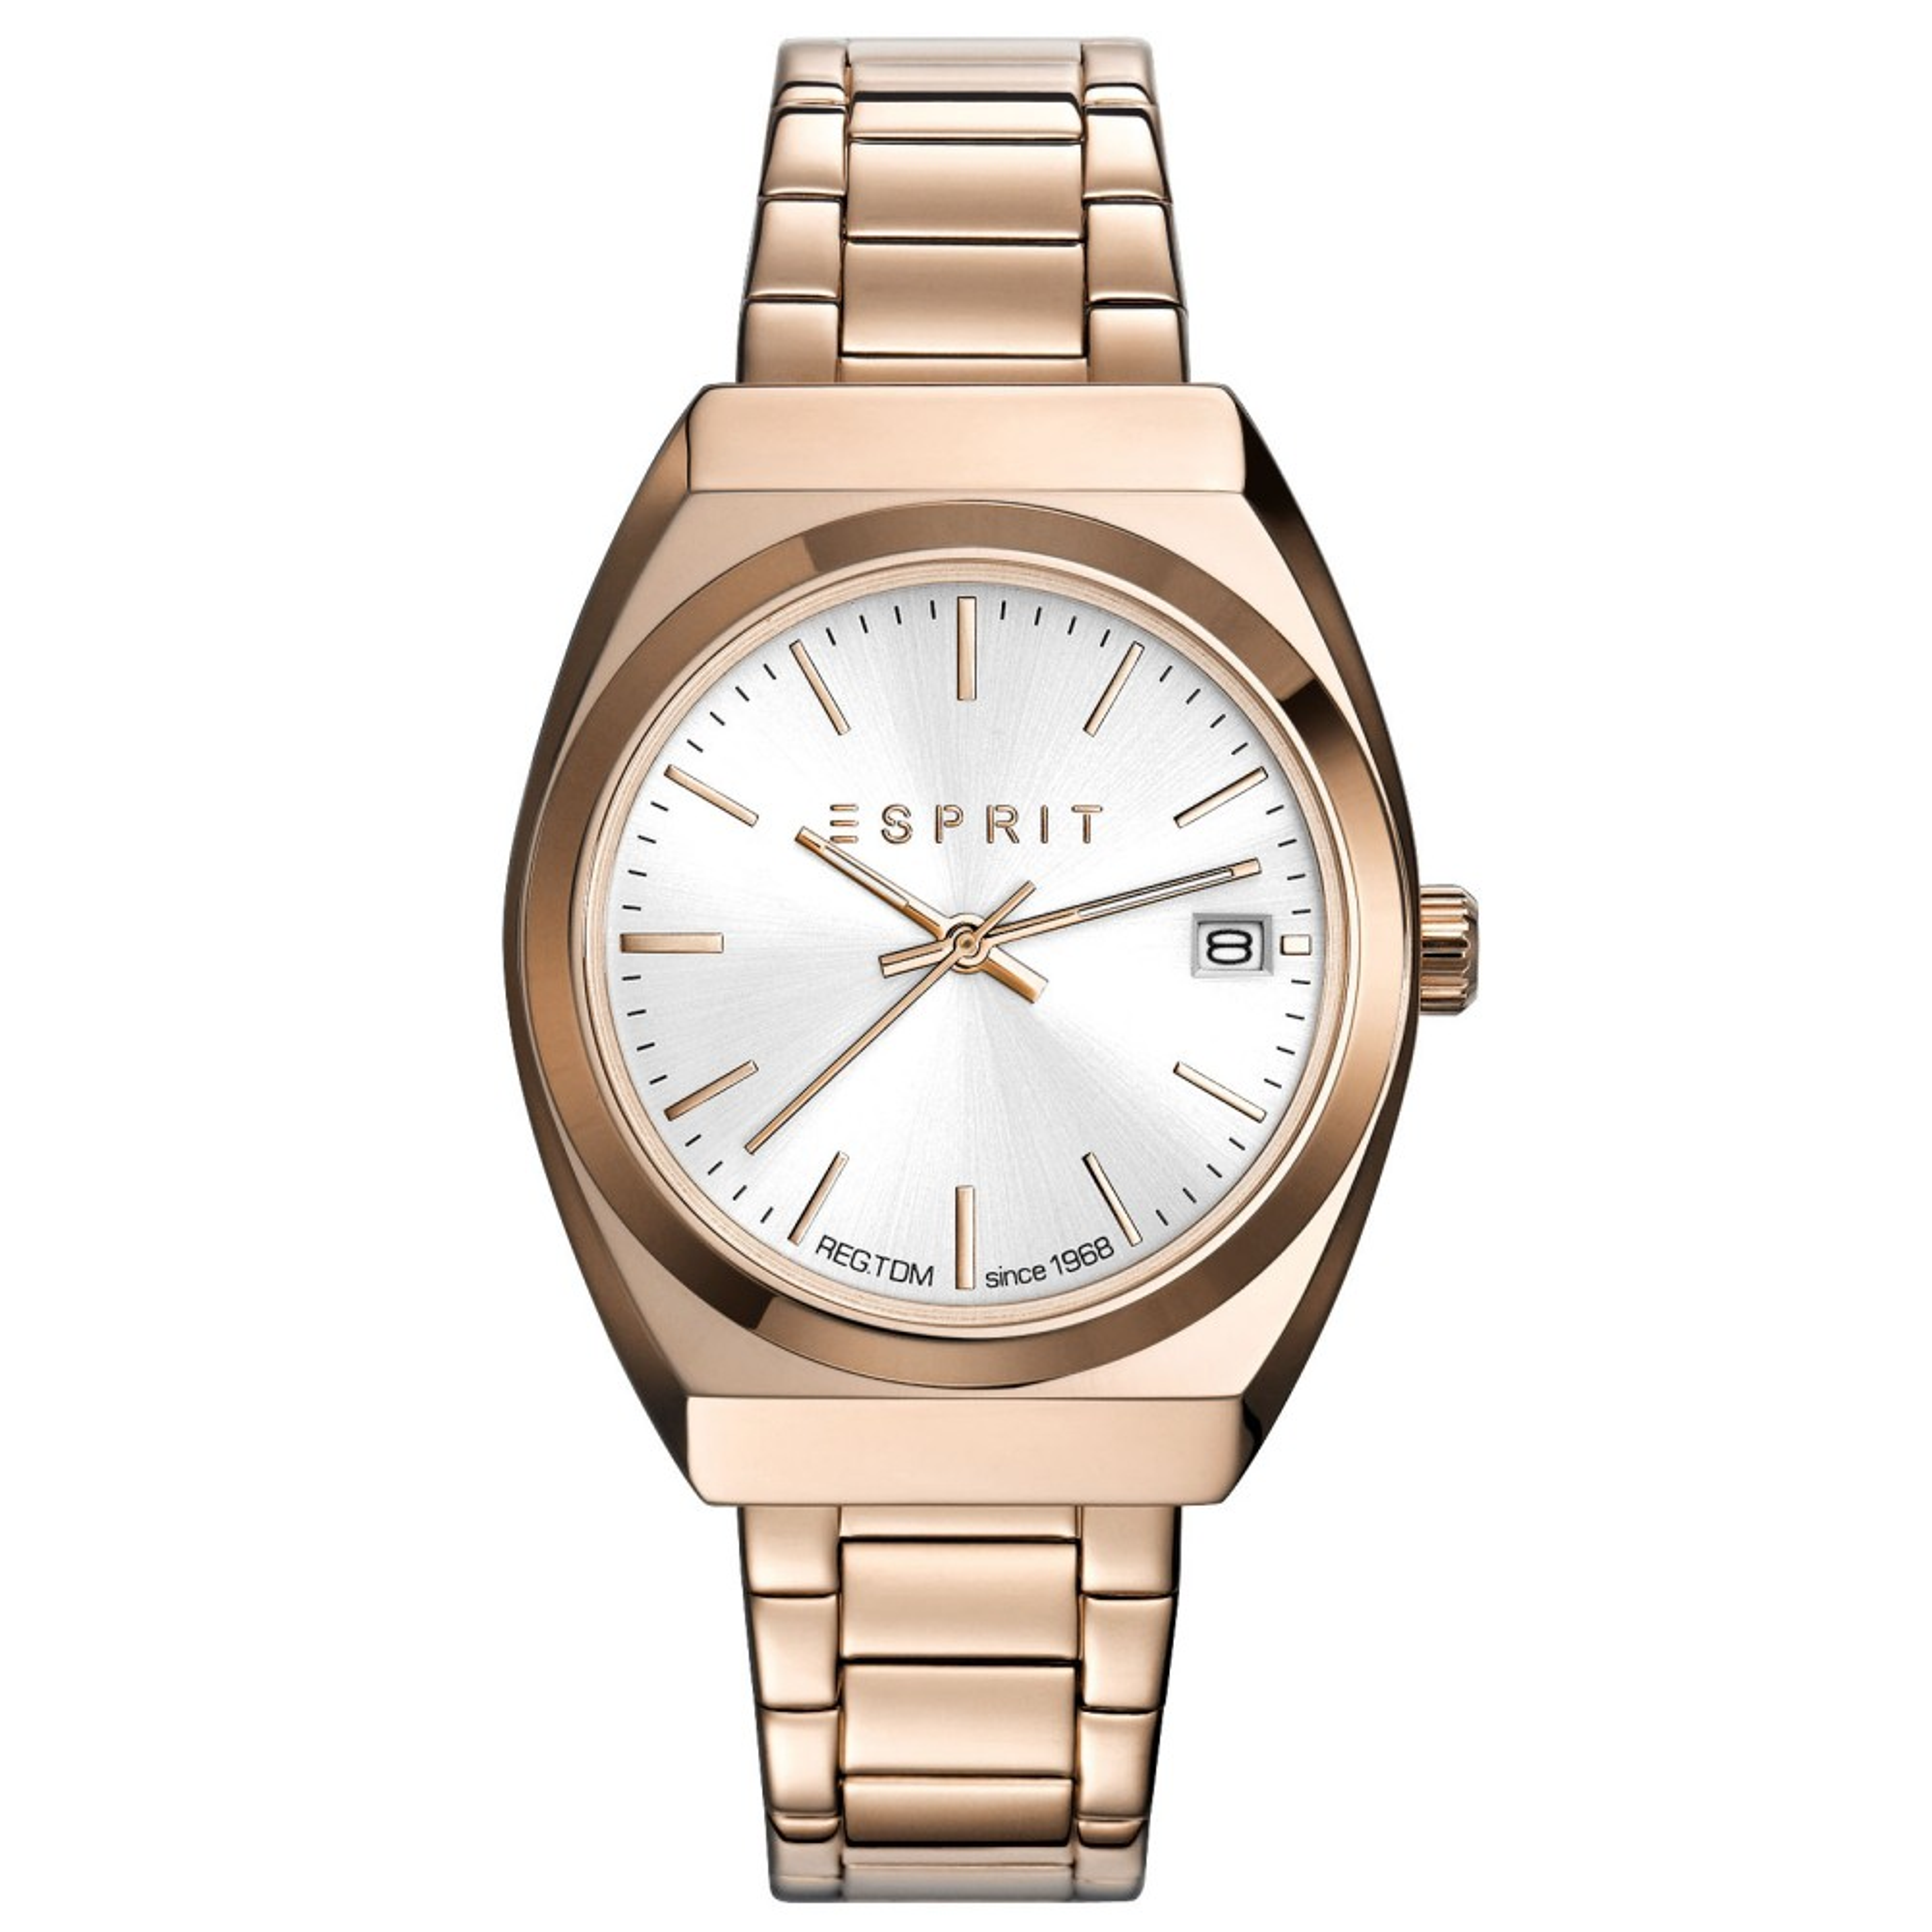 Esprit ES108522004 esprit-tp10852 rosé gold Uhr Damenuhr Datum rosé